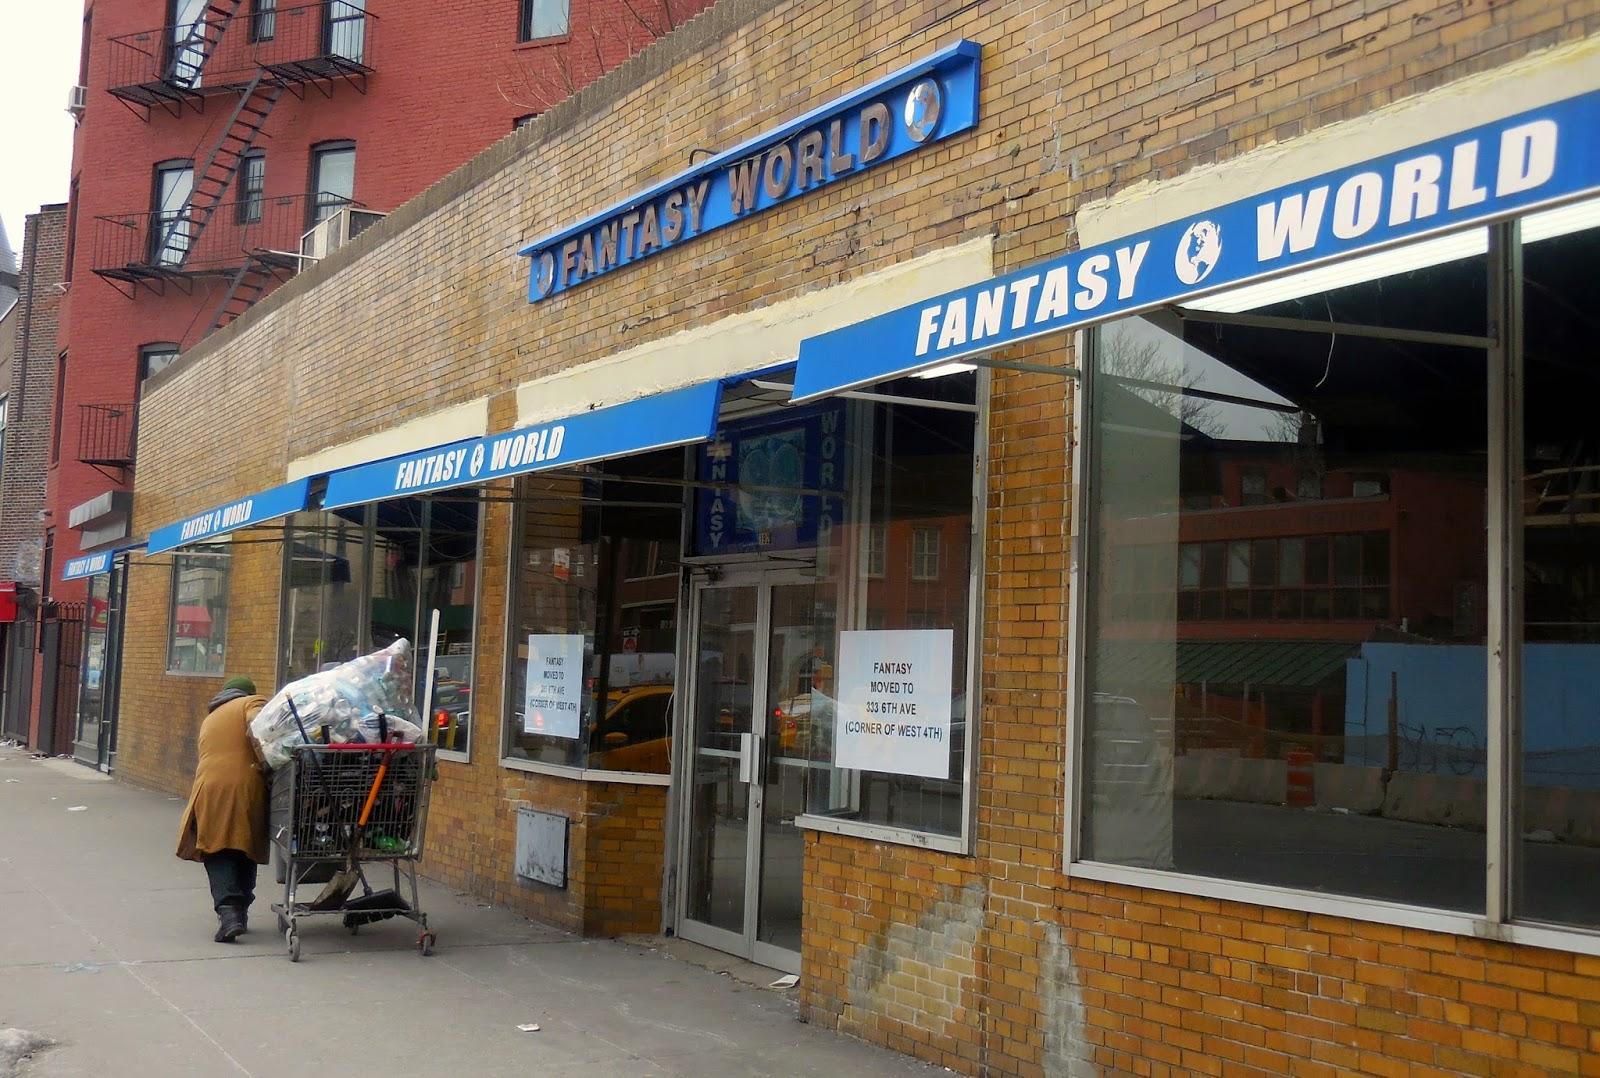 "<a href=""http://vanishingnewyork.blogspot.com/2015/02/fantasy-world-shack.html"">Jeremiah's Vanishing New York</a>"